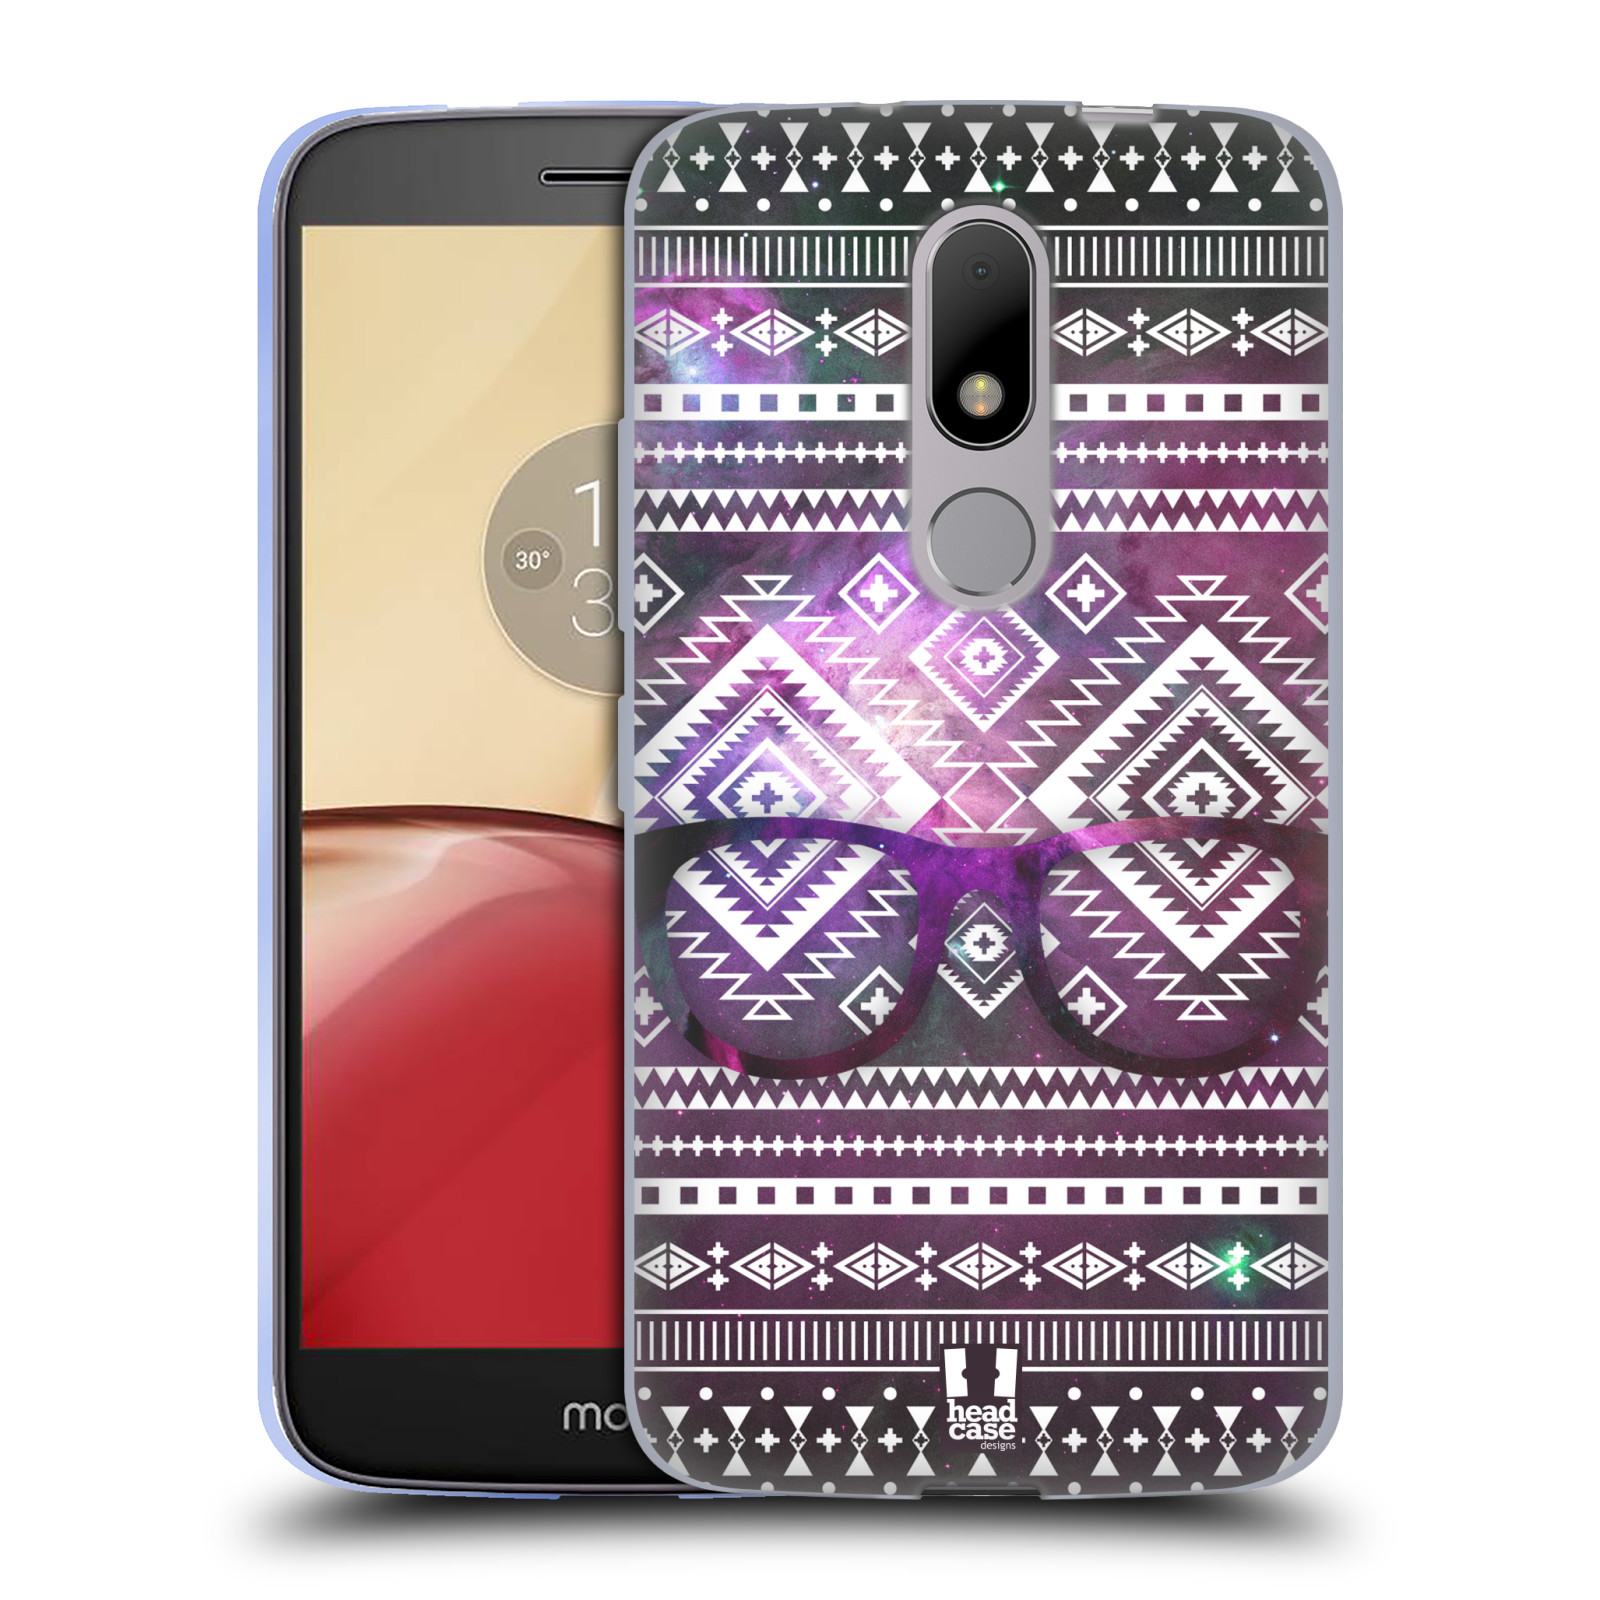 Silikonové pouzdro na mobil Lenovo Moto M - Head Case NEBULA BRÝLE (Silikonový kryt či obal na mobilní telefon Lenovo Moto M (Dual Sim))